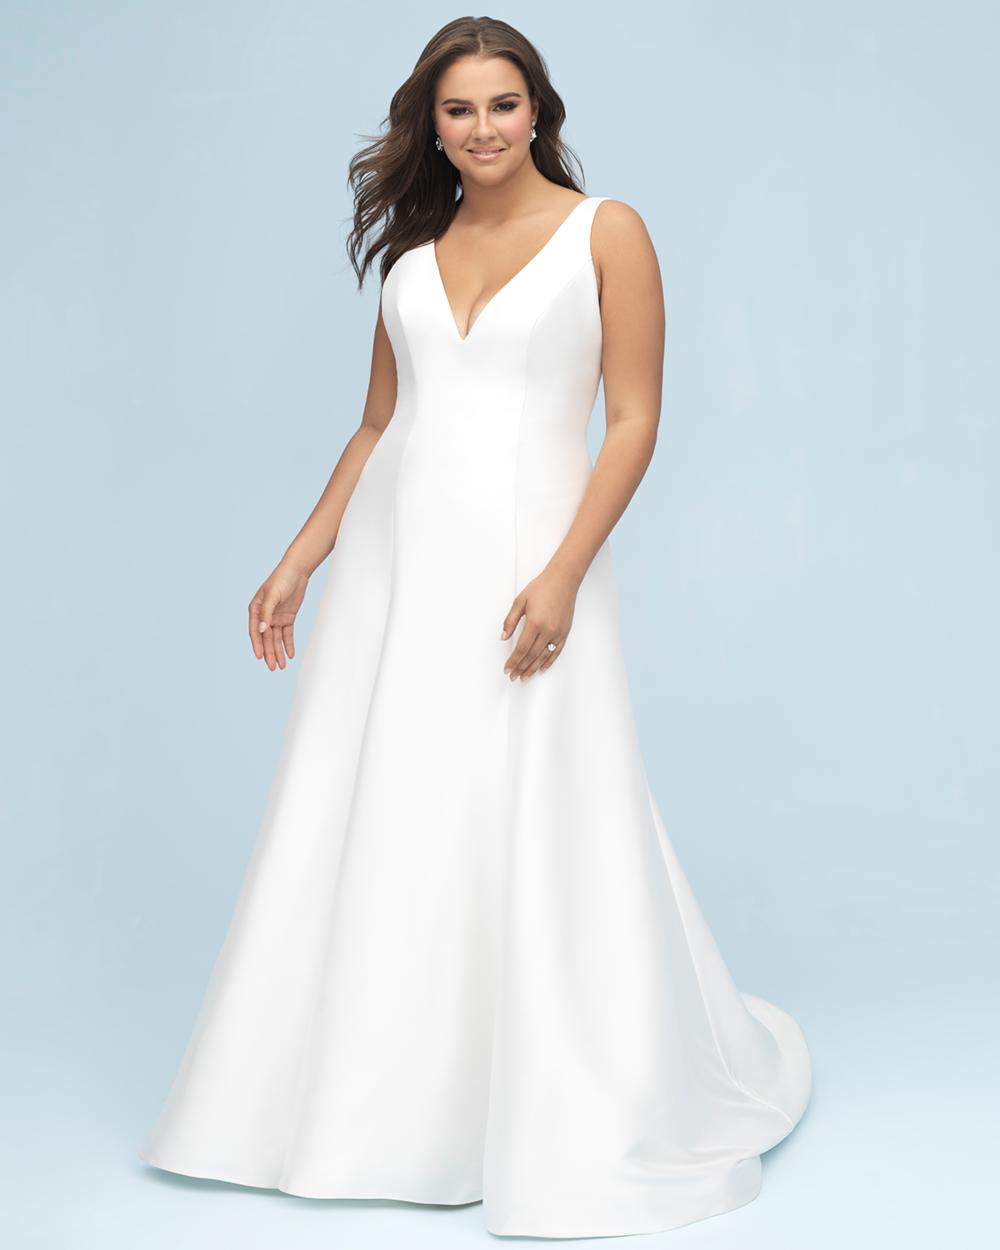 plus-size-wedding-dresses-allure-bridals-j-andrews.jpg